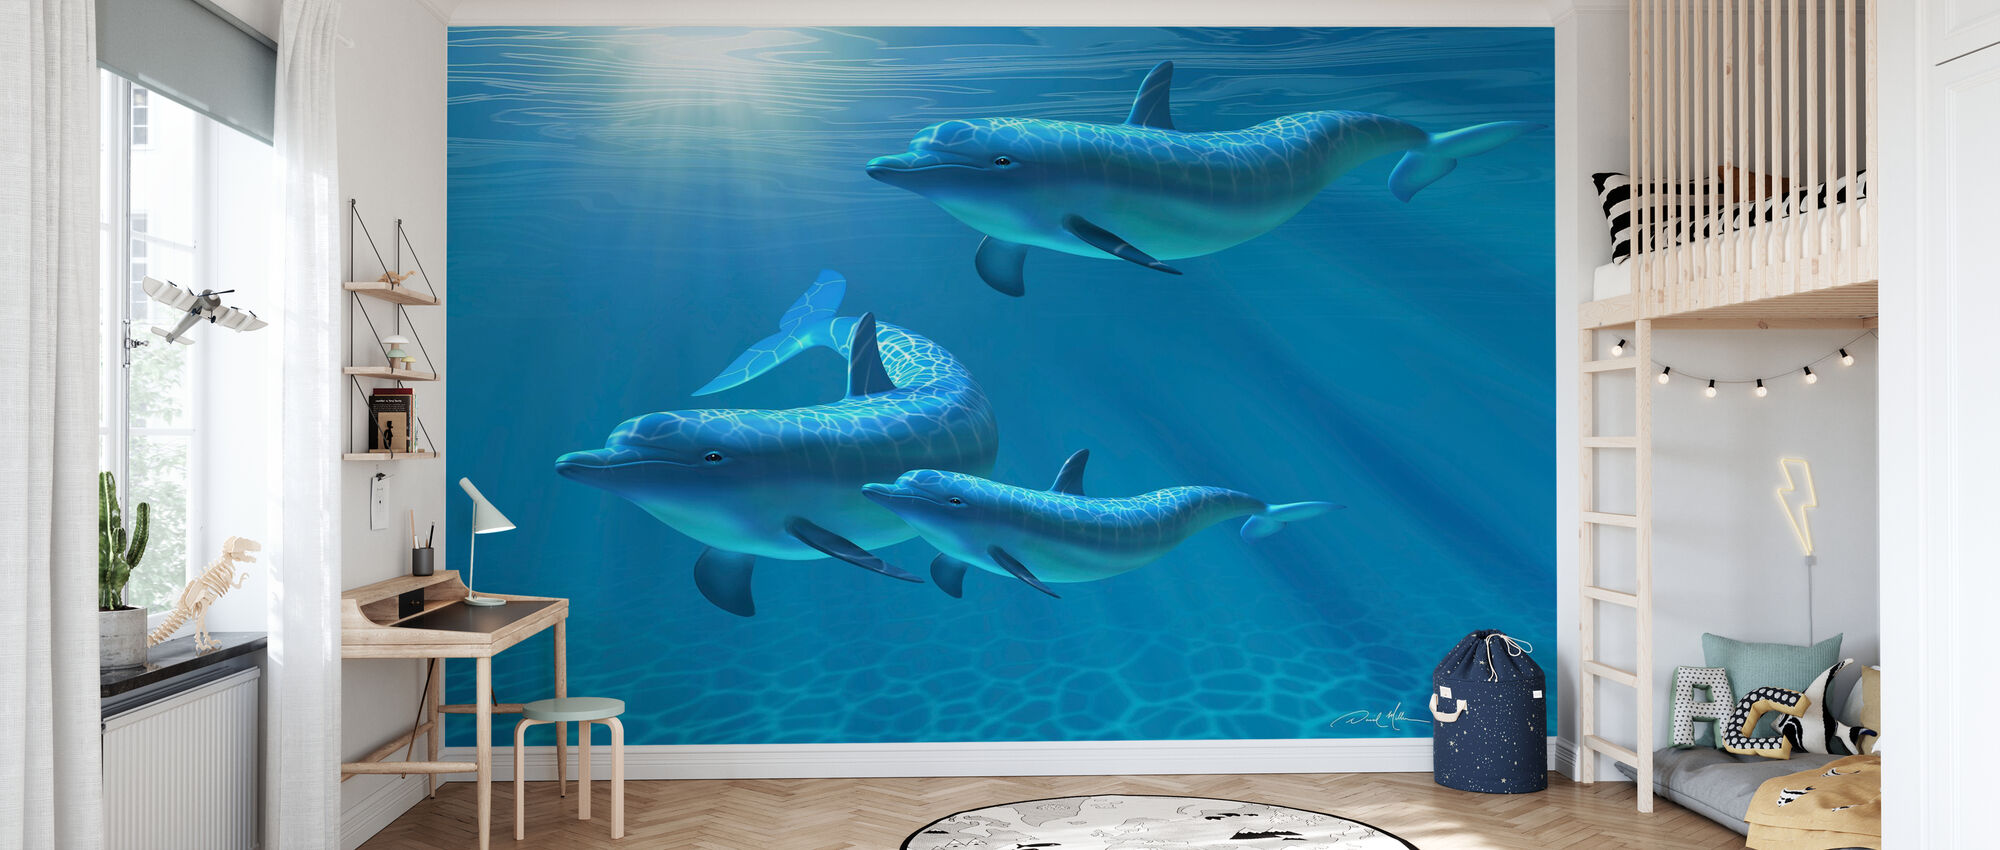 Dolphin Family of Three - Wallpaper - Kids Room